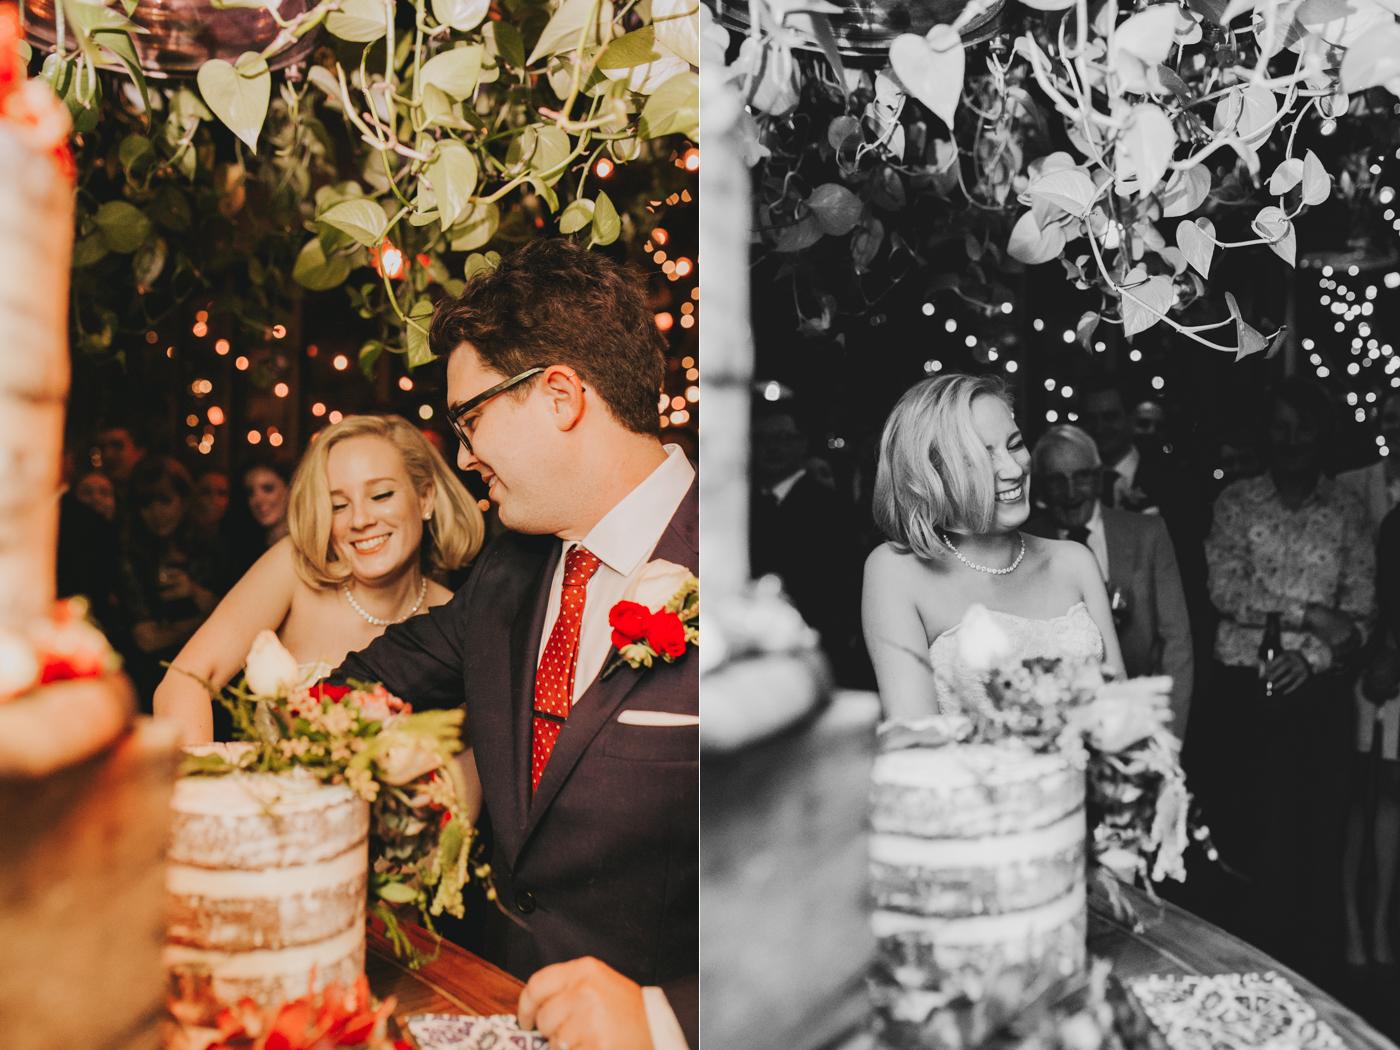 Jo & Tom Wedding - The Grounds of Alexandria - Samantha Heather Photography-365.jpg